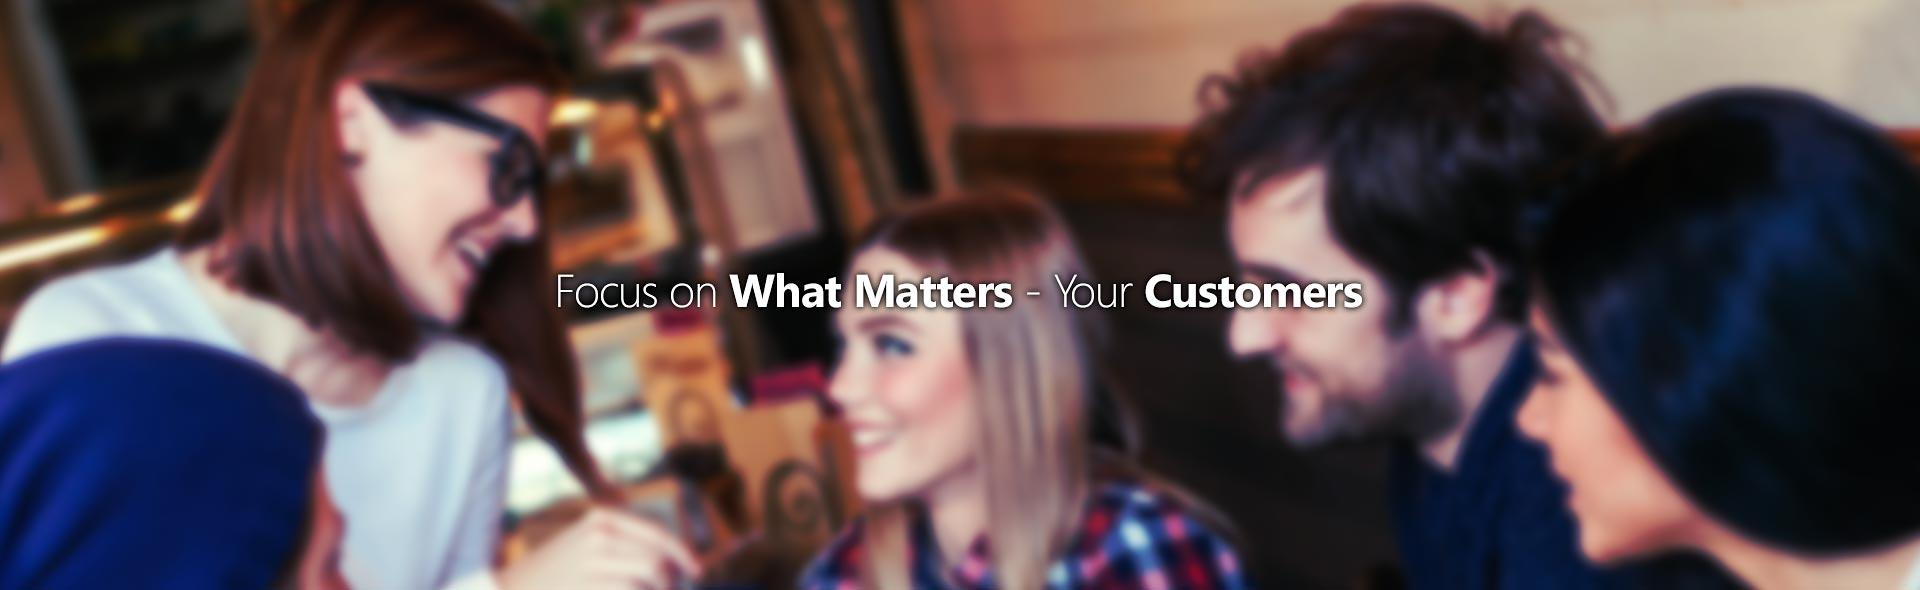 header_blur_customers.jpg